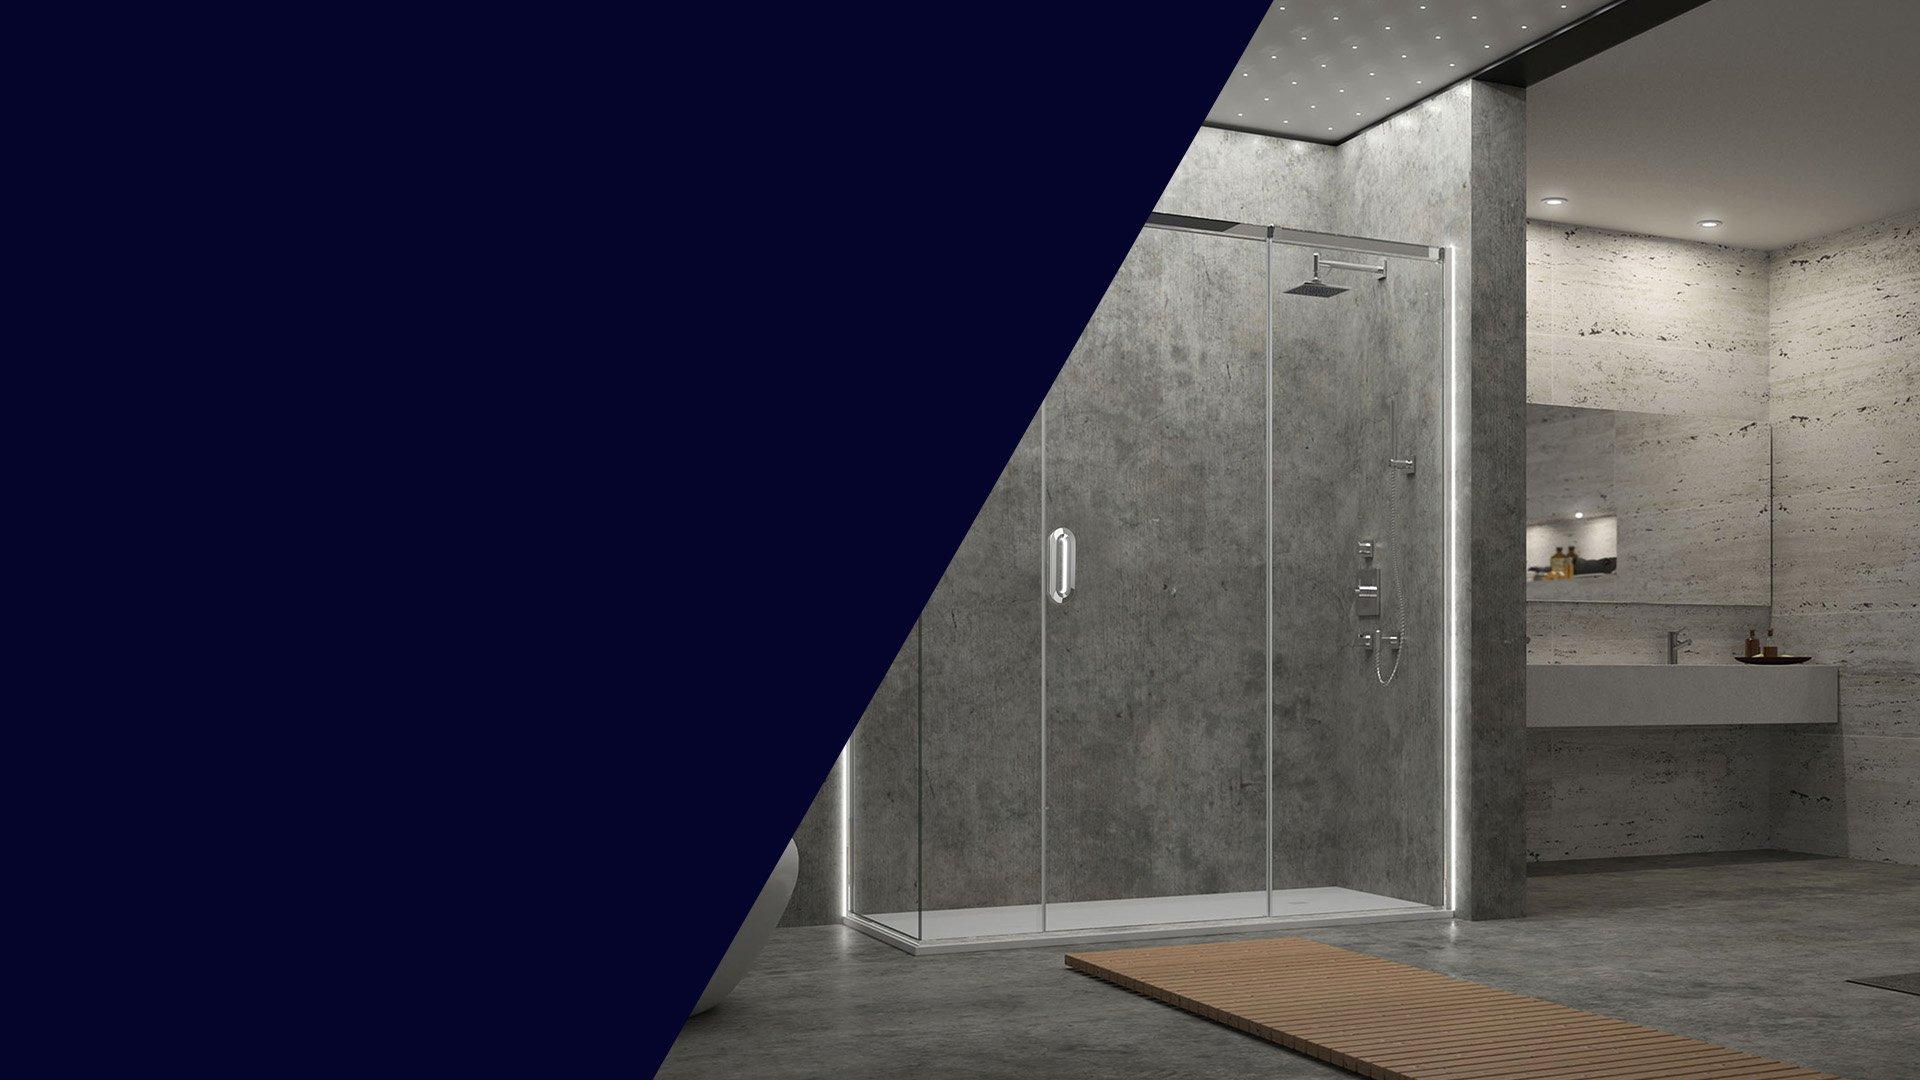 01-Arysto-Bathroom Environment-Edited